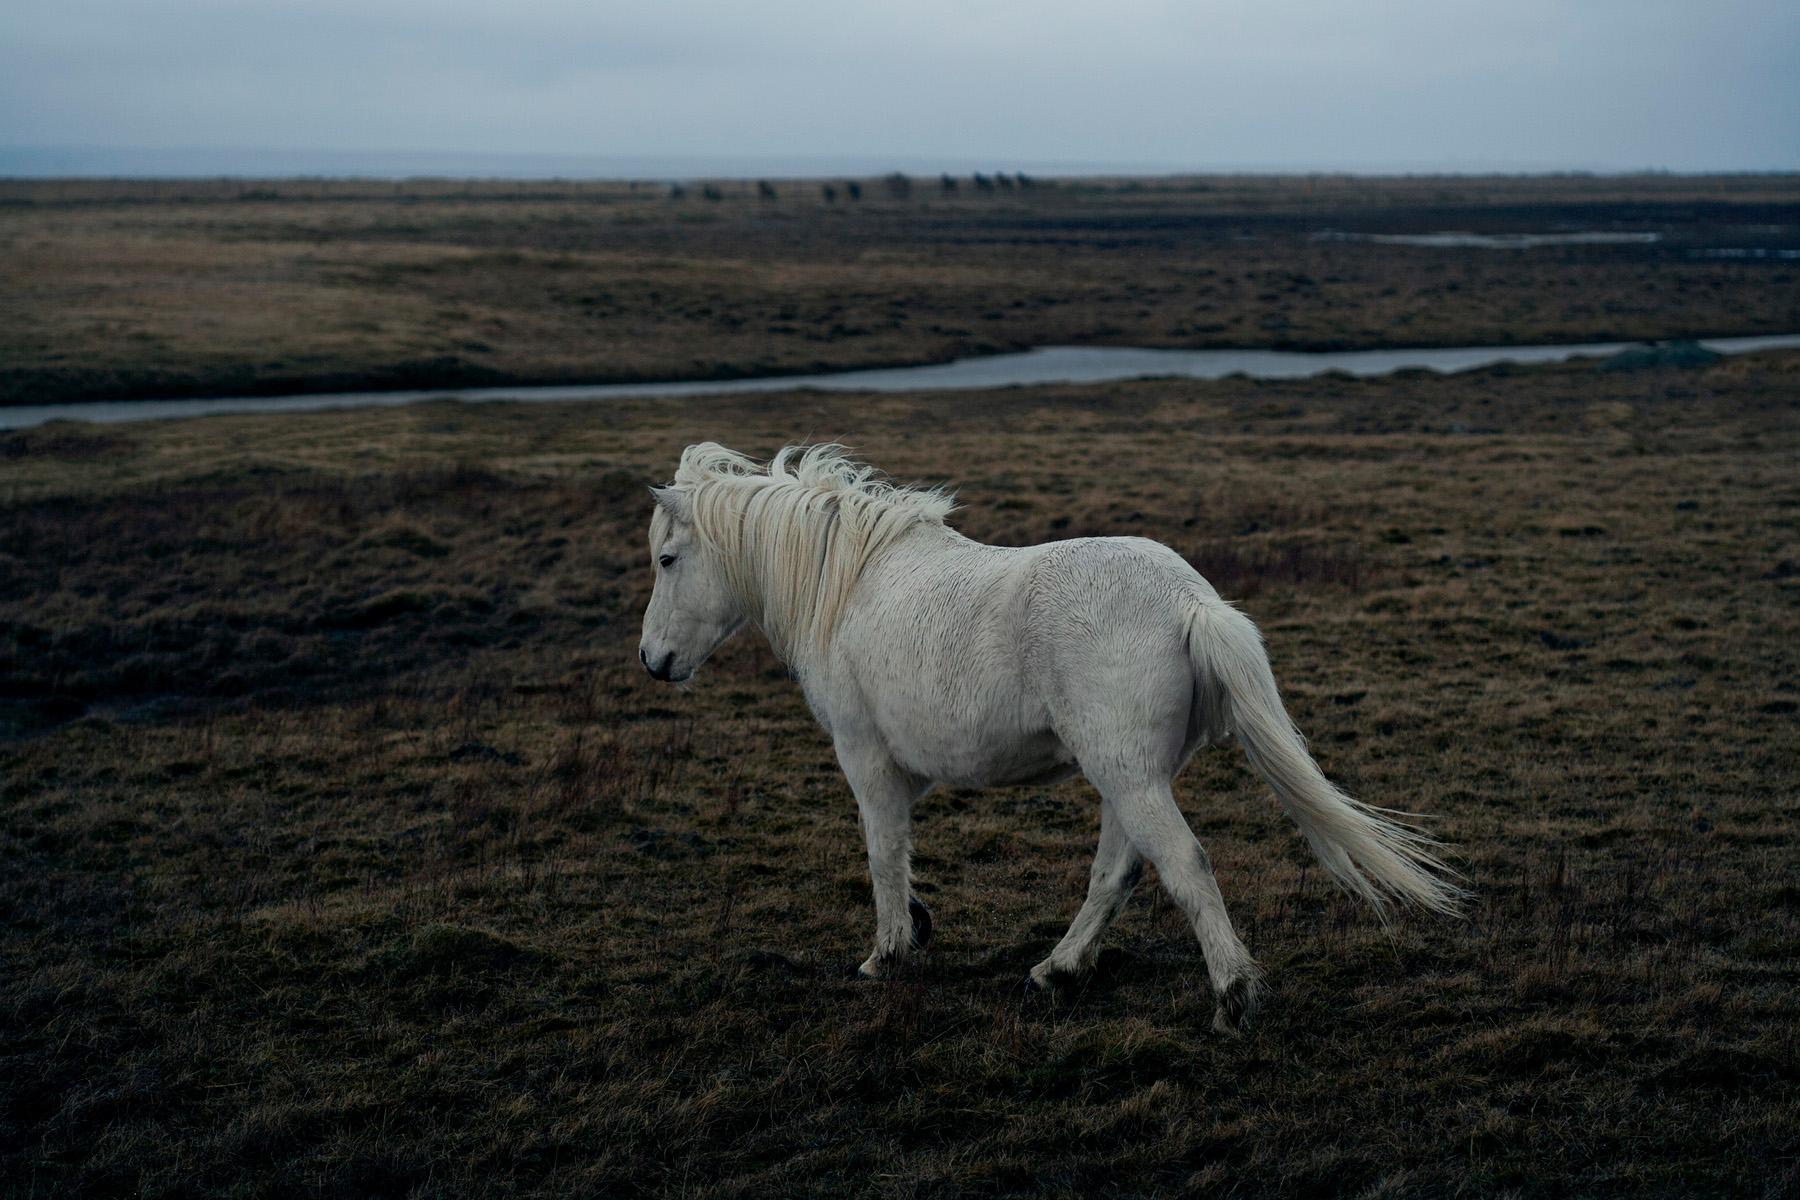 218807-11227734-Iceland_Day06-01-001793_jpg.jpg